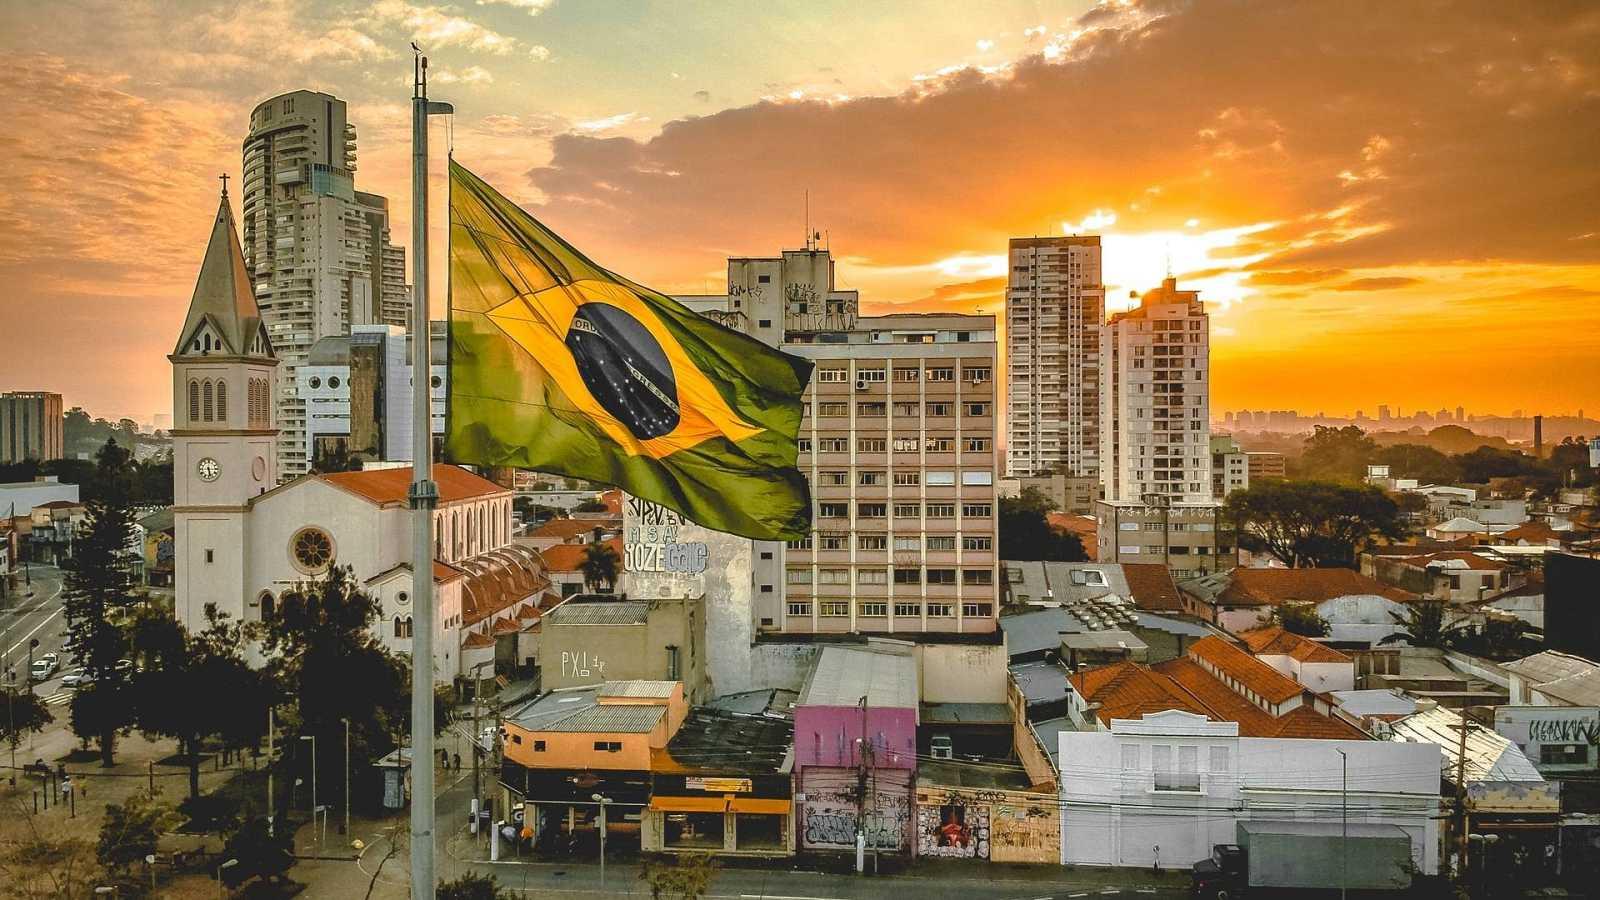 Cierra la puerta - Eu tenho Saudade (Ay, Brasil...) - 29/11/20 - escuchar ahora